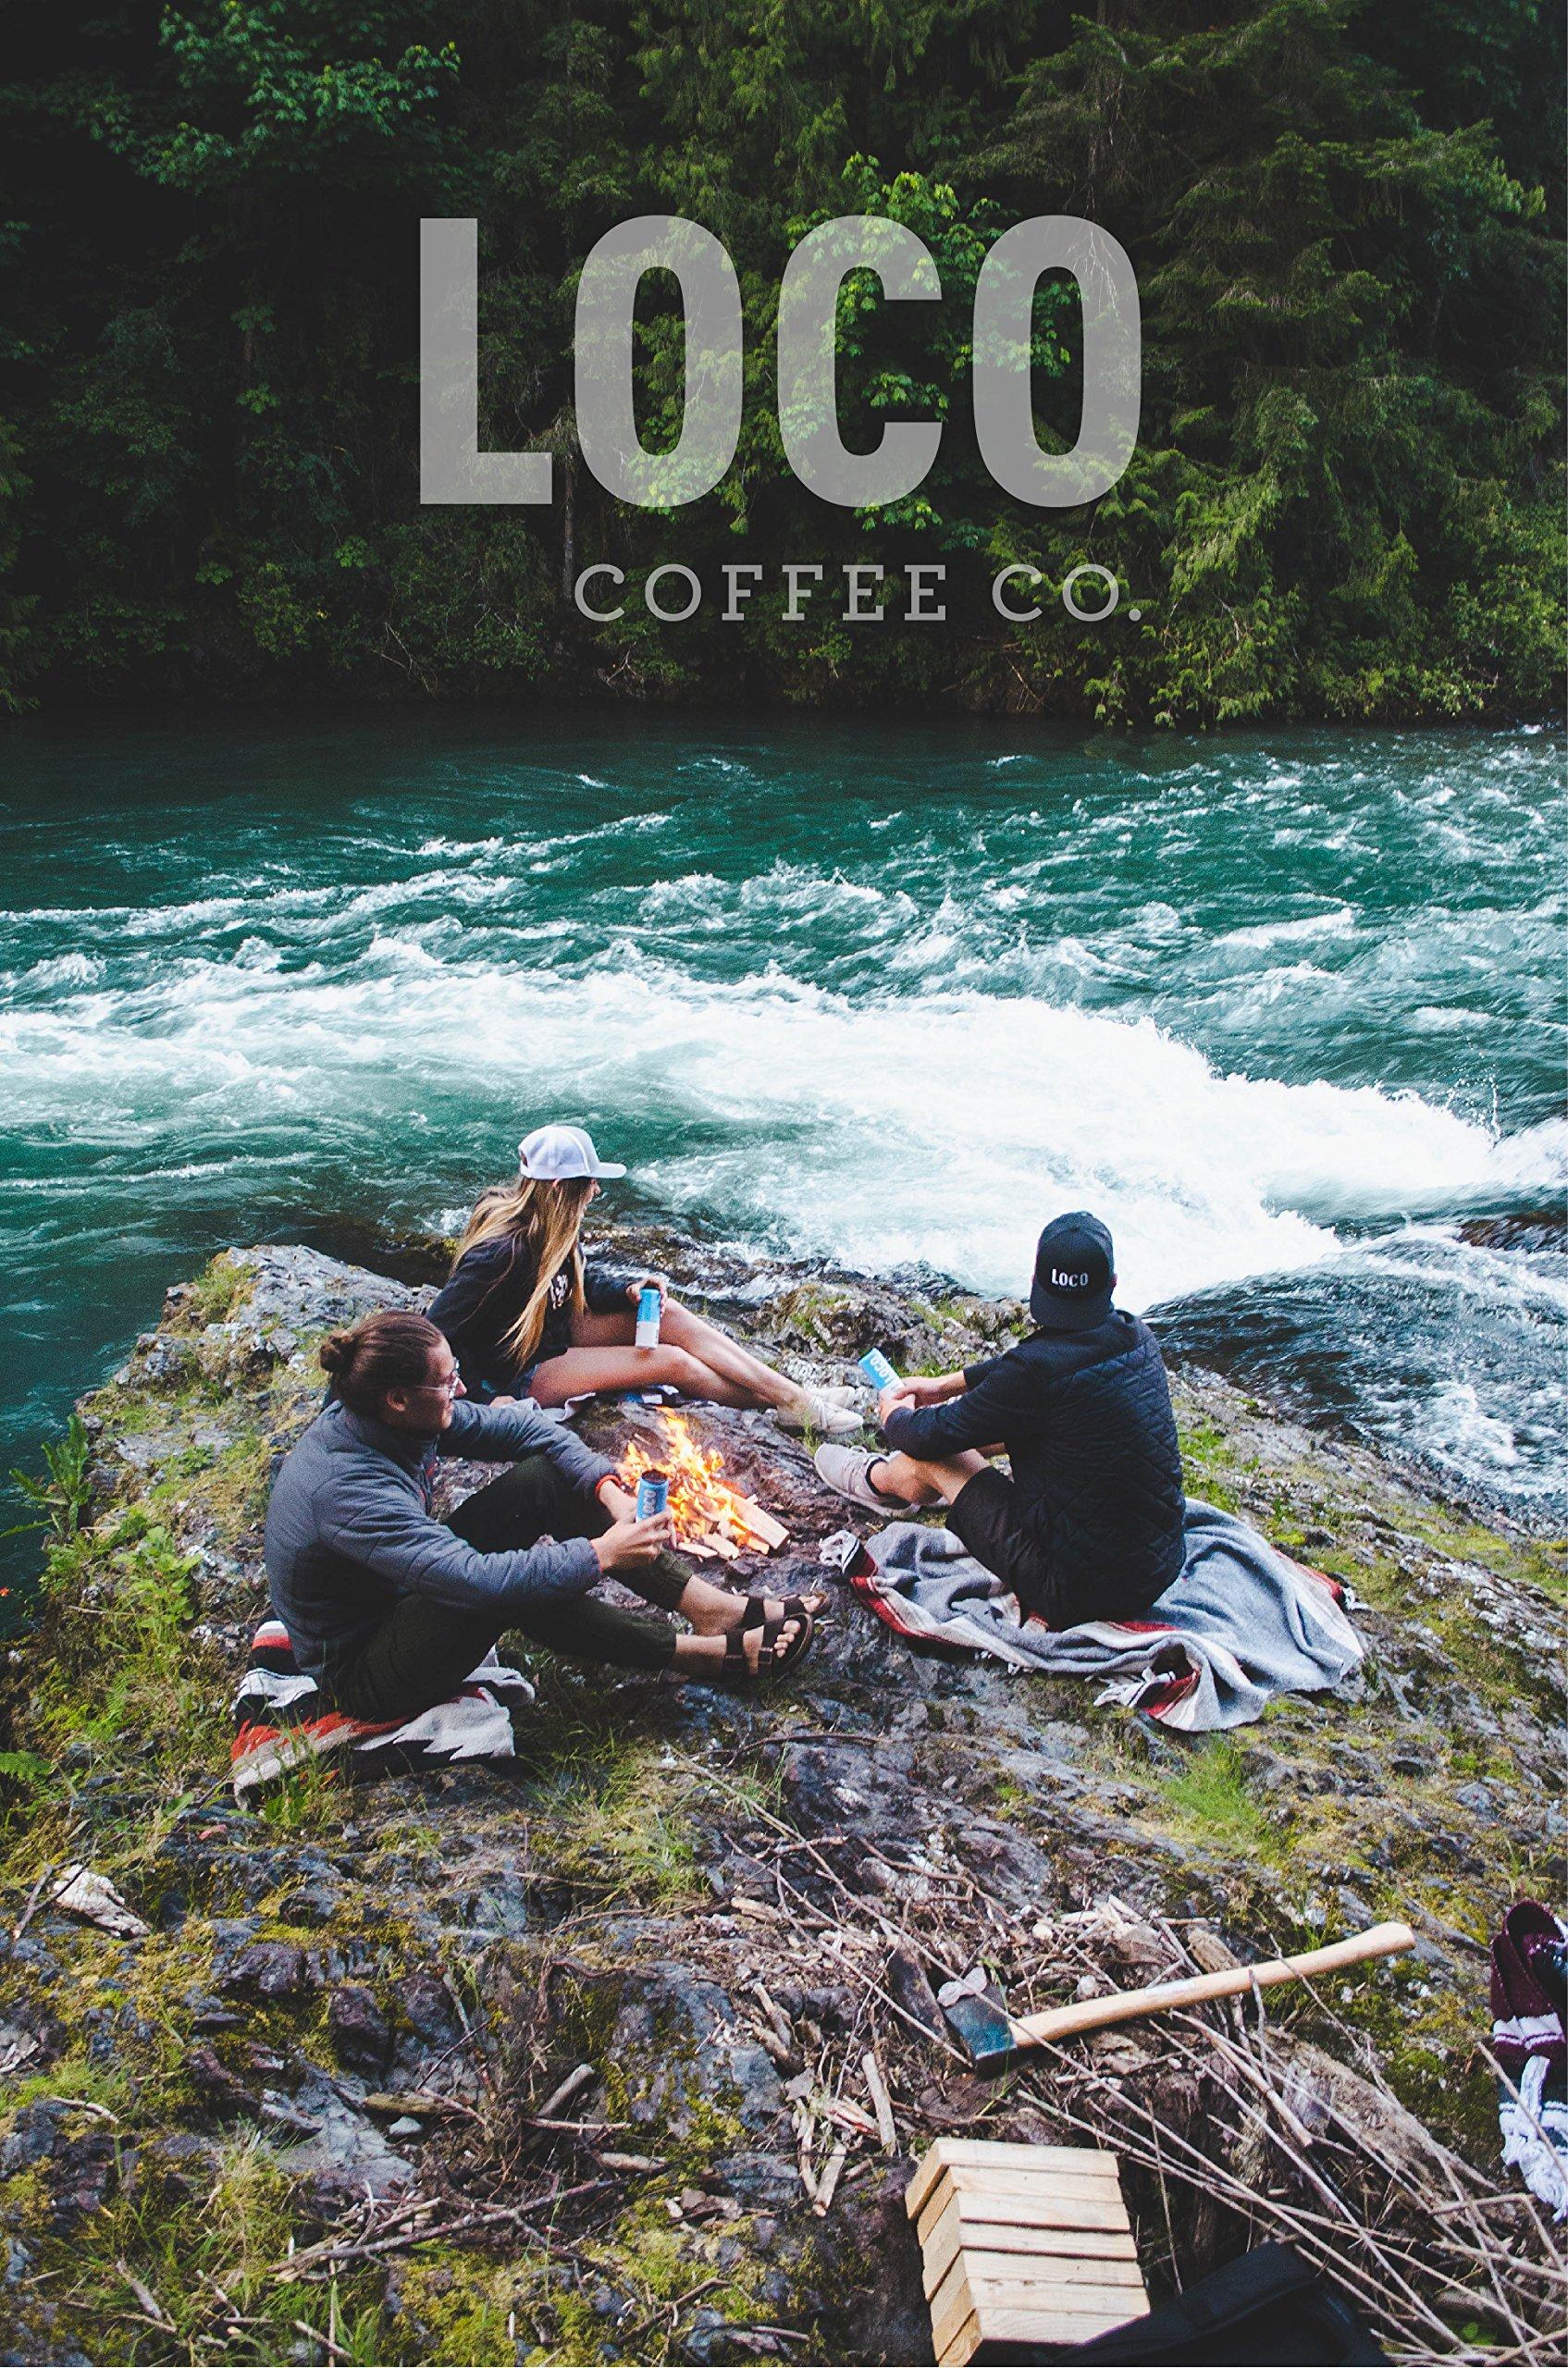 Loco Coffee (12 12 fl. oz. cans)   Cold Brew Coffee + Coconut Water   No Preservatives   No Added Sugar   Caffeine + Electrolytes